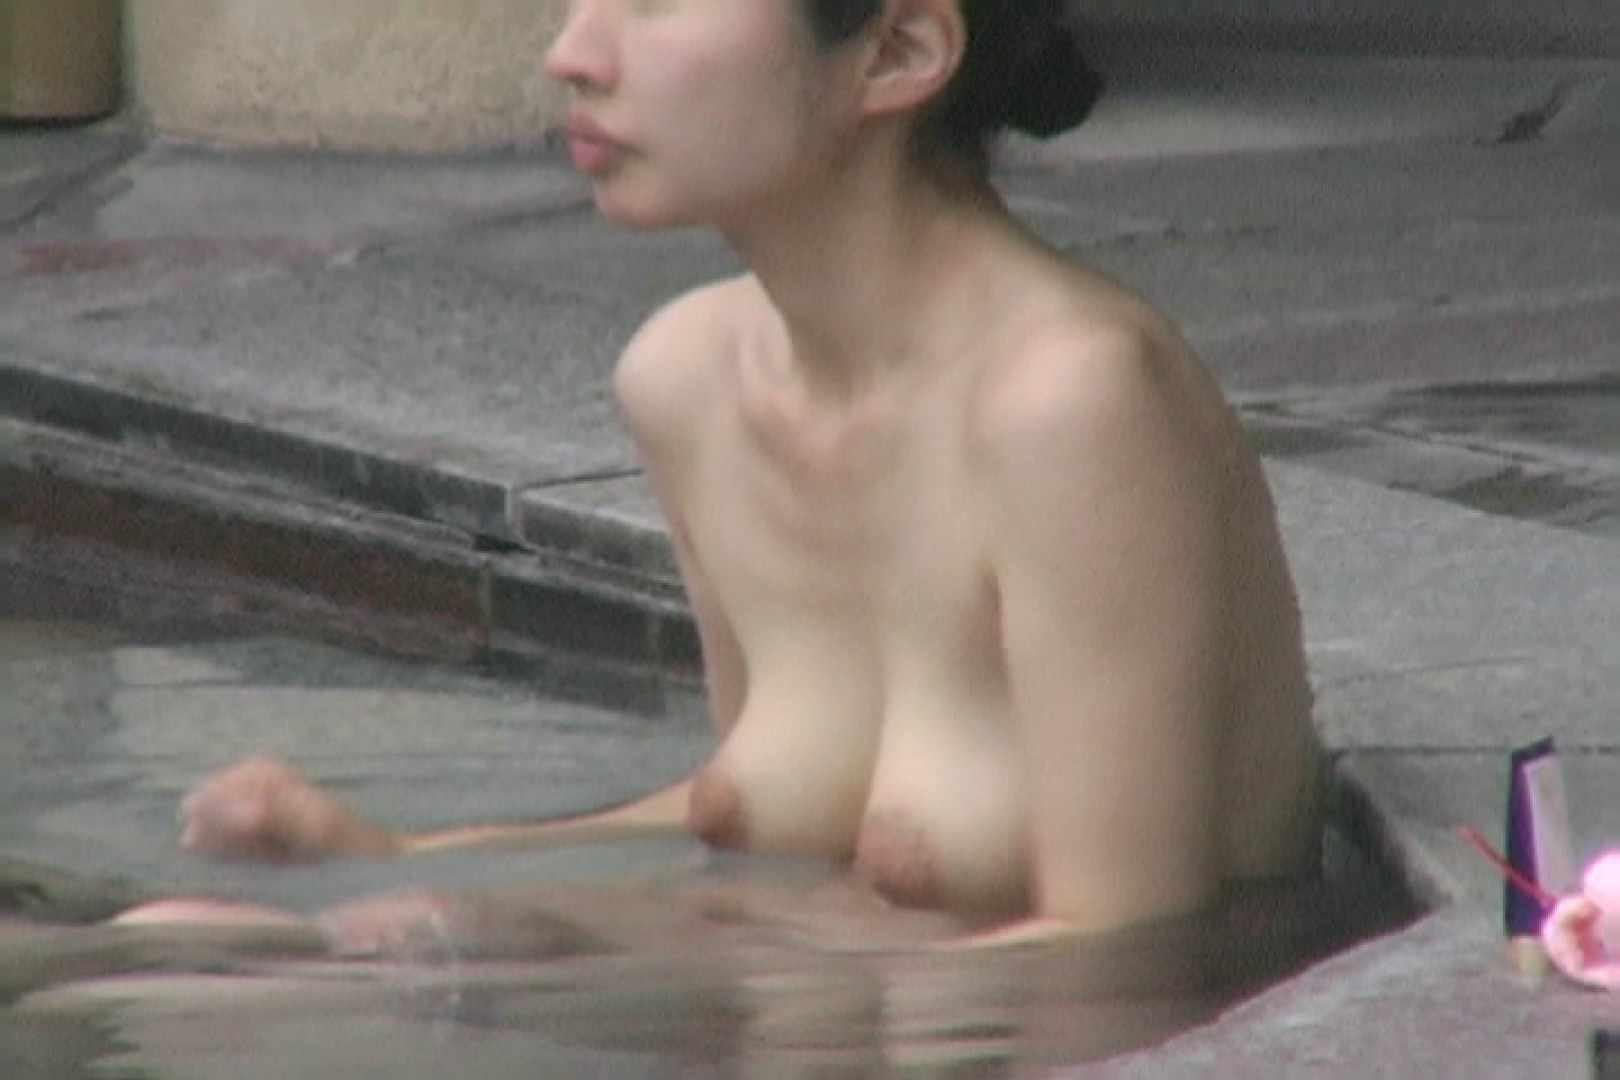 Aquaな露天風呂Vol.642 盗撮師作品 セックス画像 86pic 62